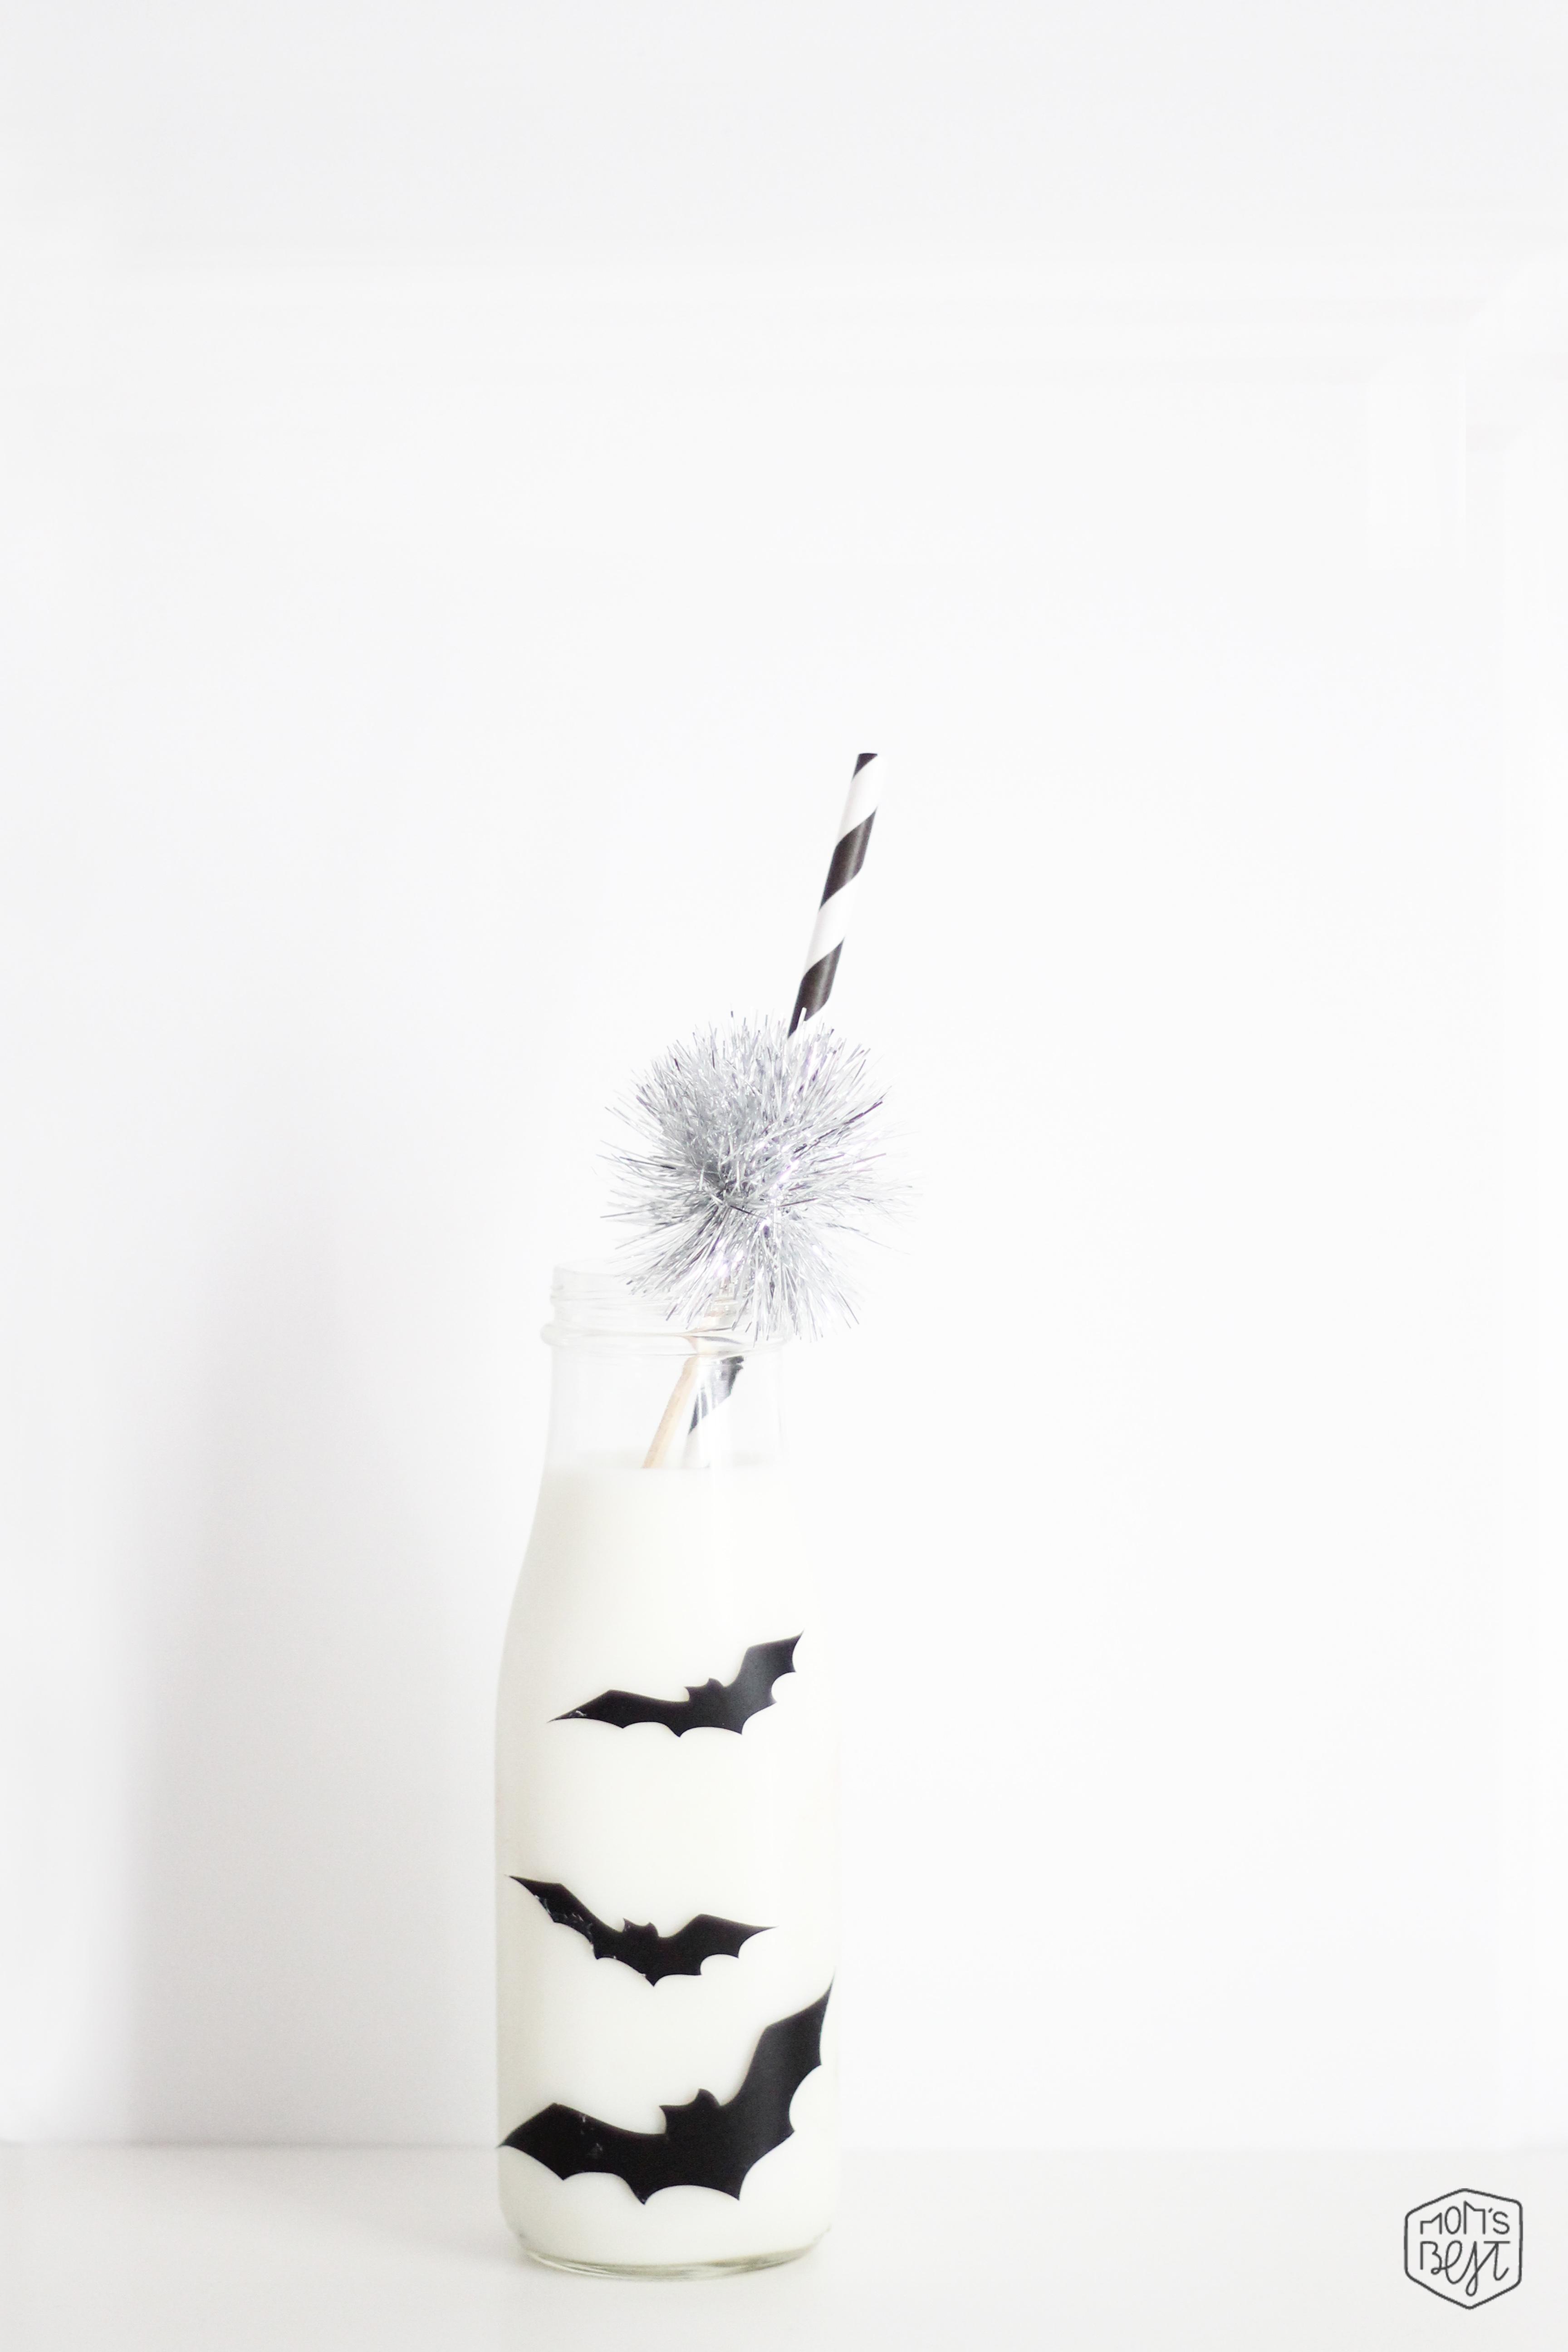 2 Minute DIY Spooky Bat Milk Bottles